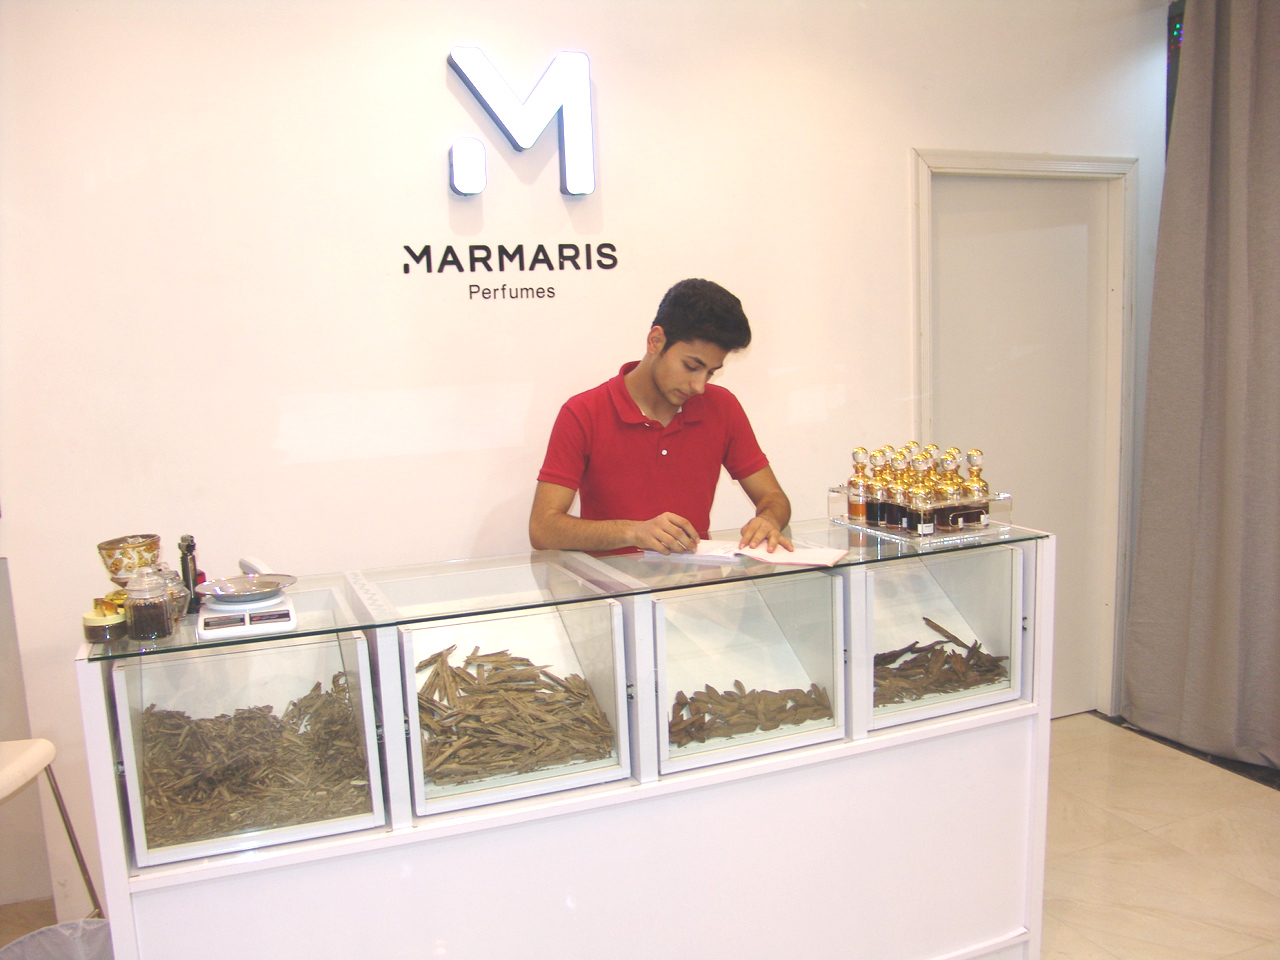 Marmaris Perfumes - DSC03991.jpg